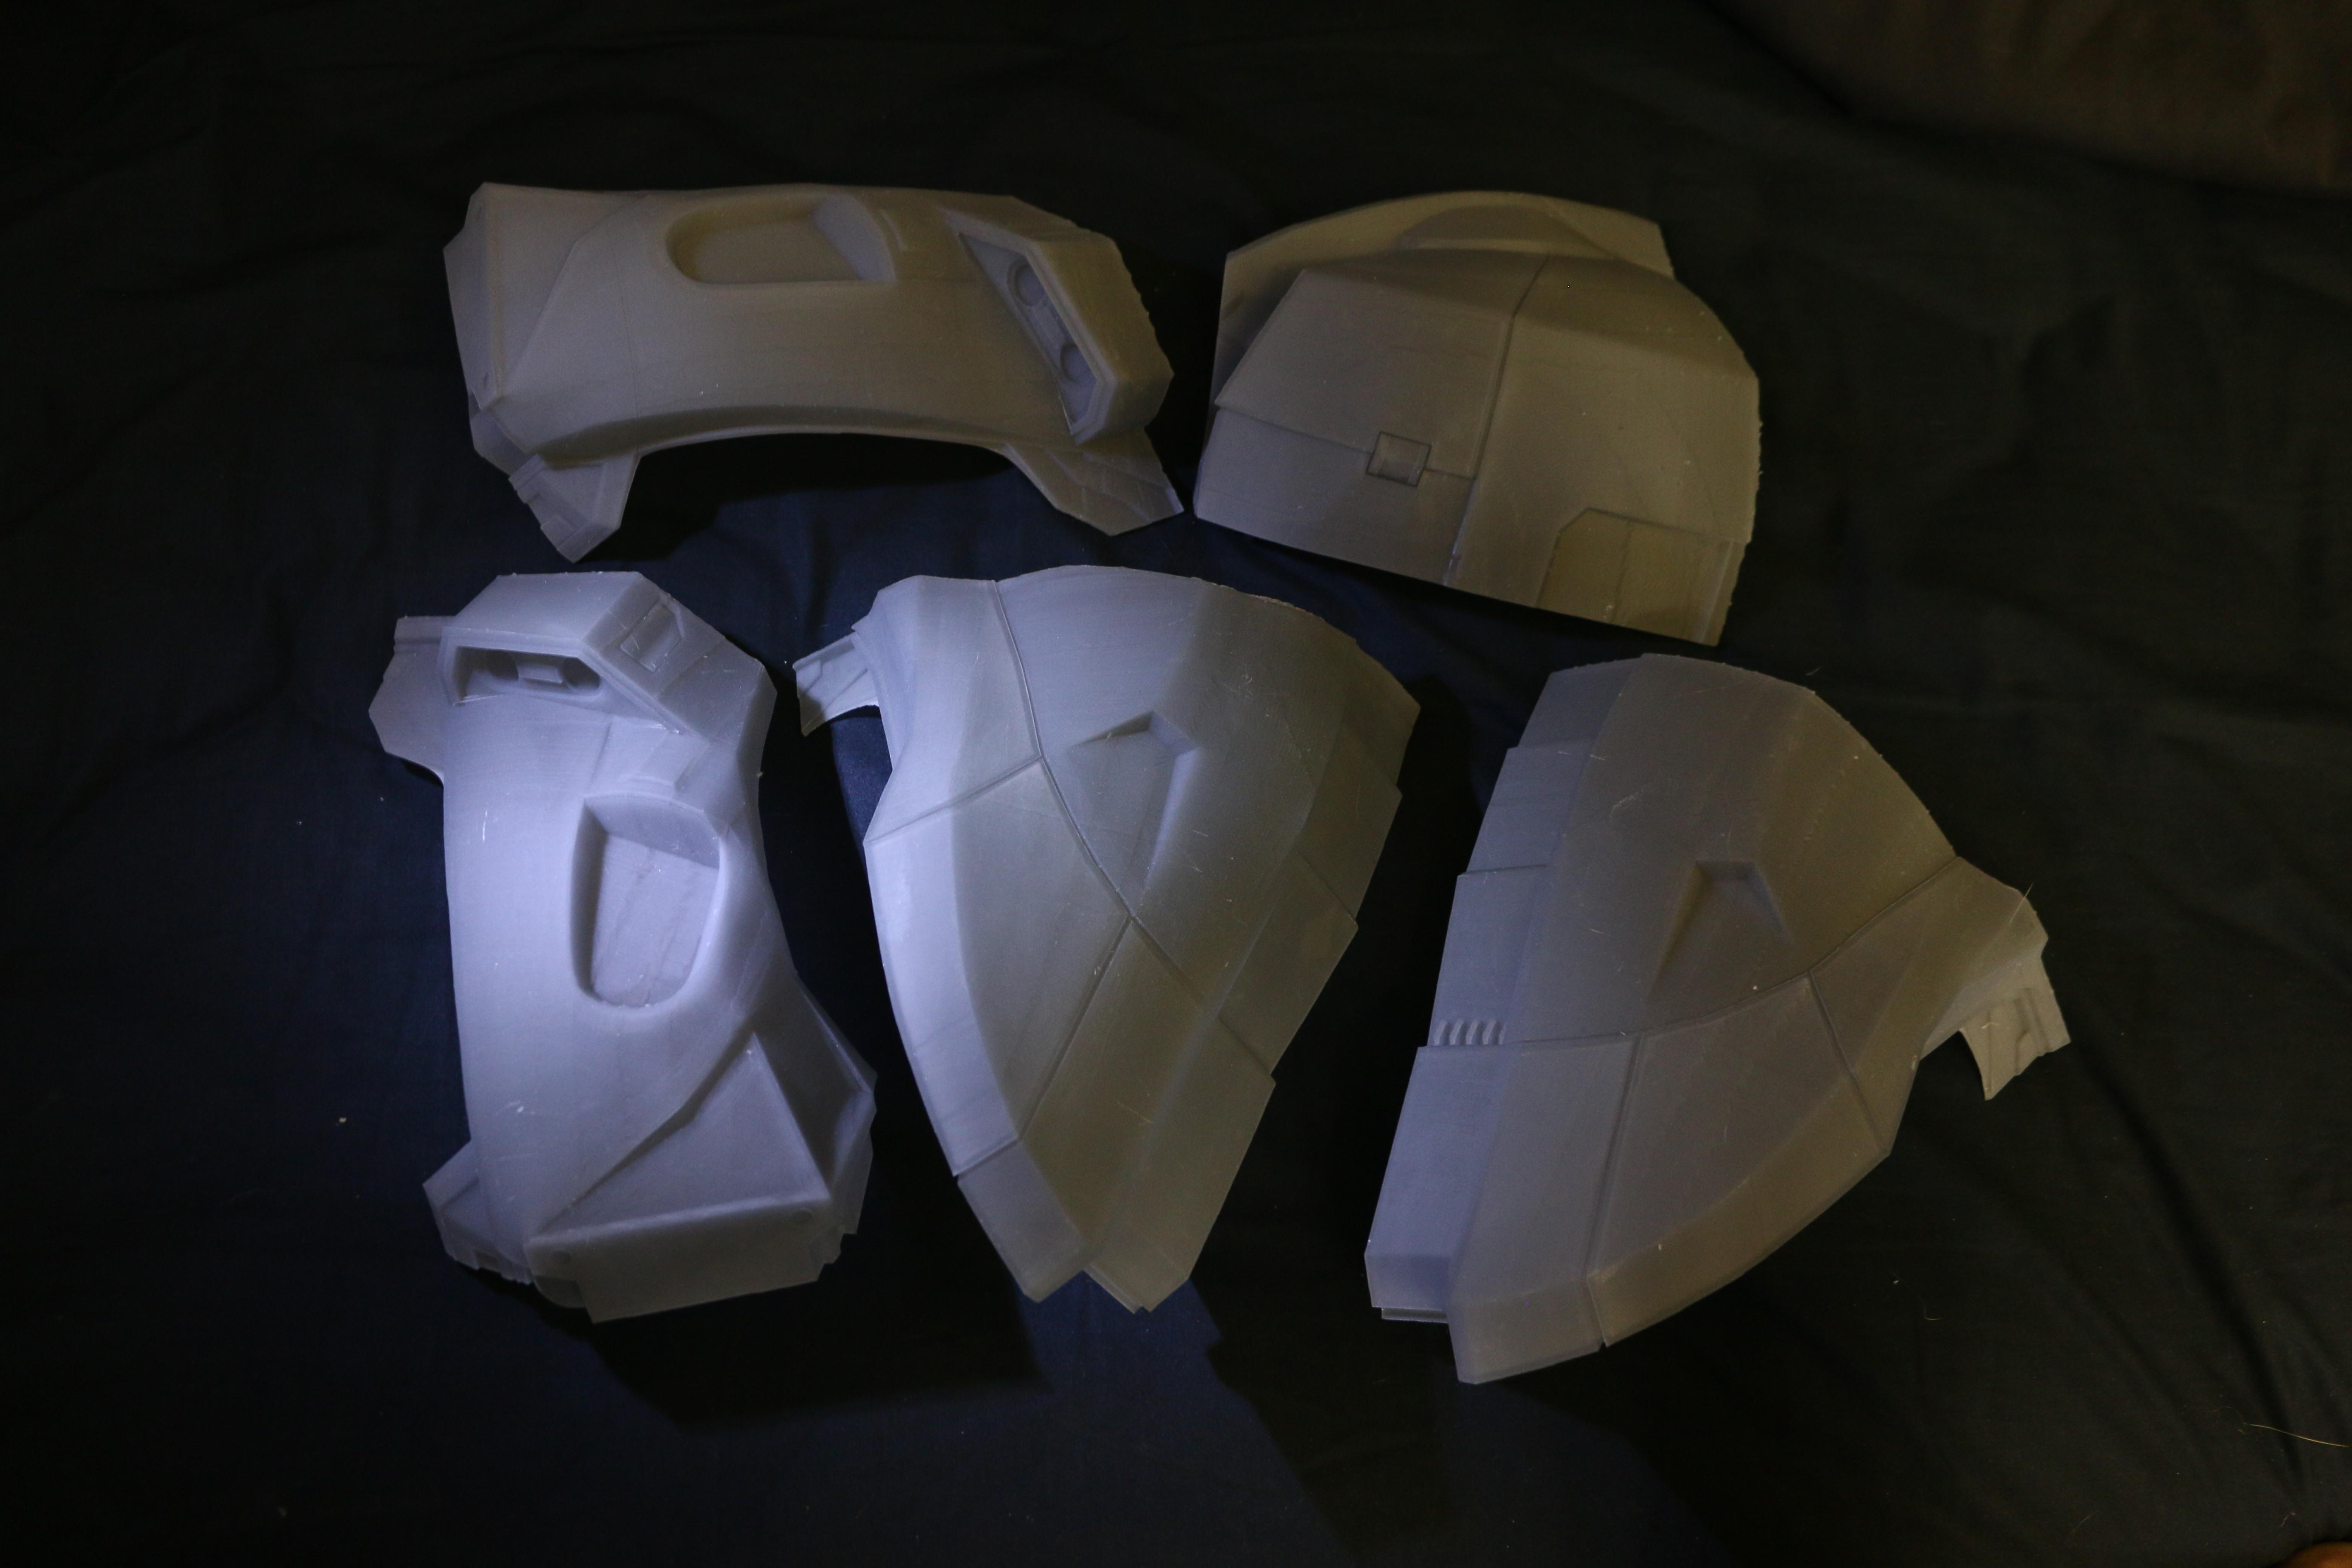 Xtremenoobs Halo Infinite Build Rpf Costume And Prop Maker